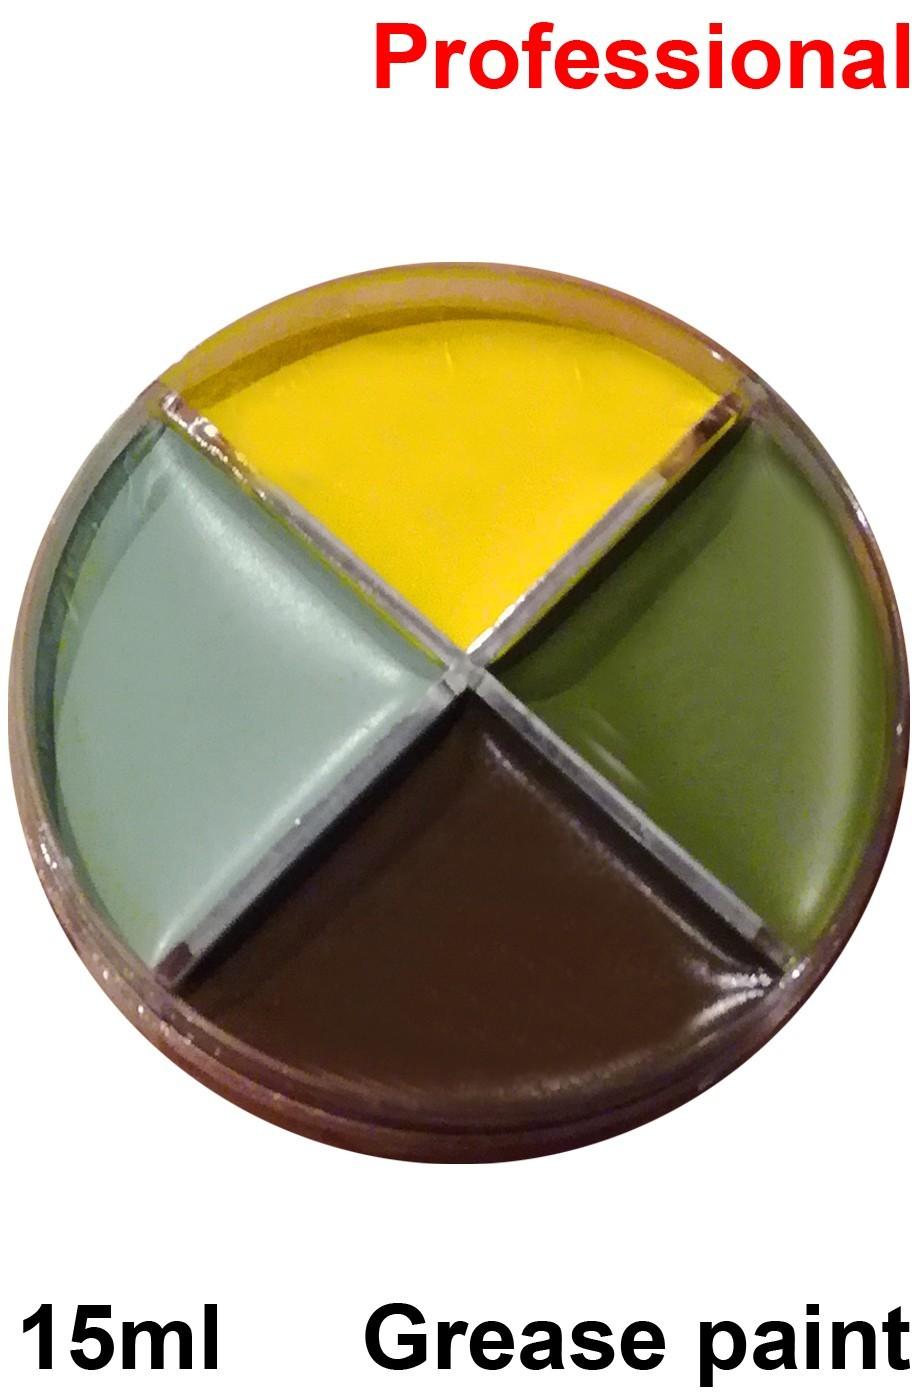 Trucco teatrale palette in cialda grease 4 colori finissage carne 15gr